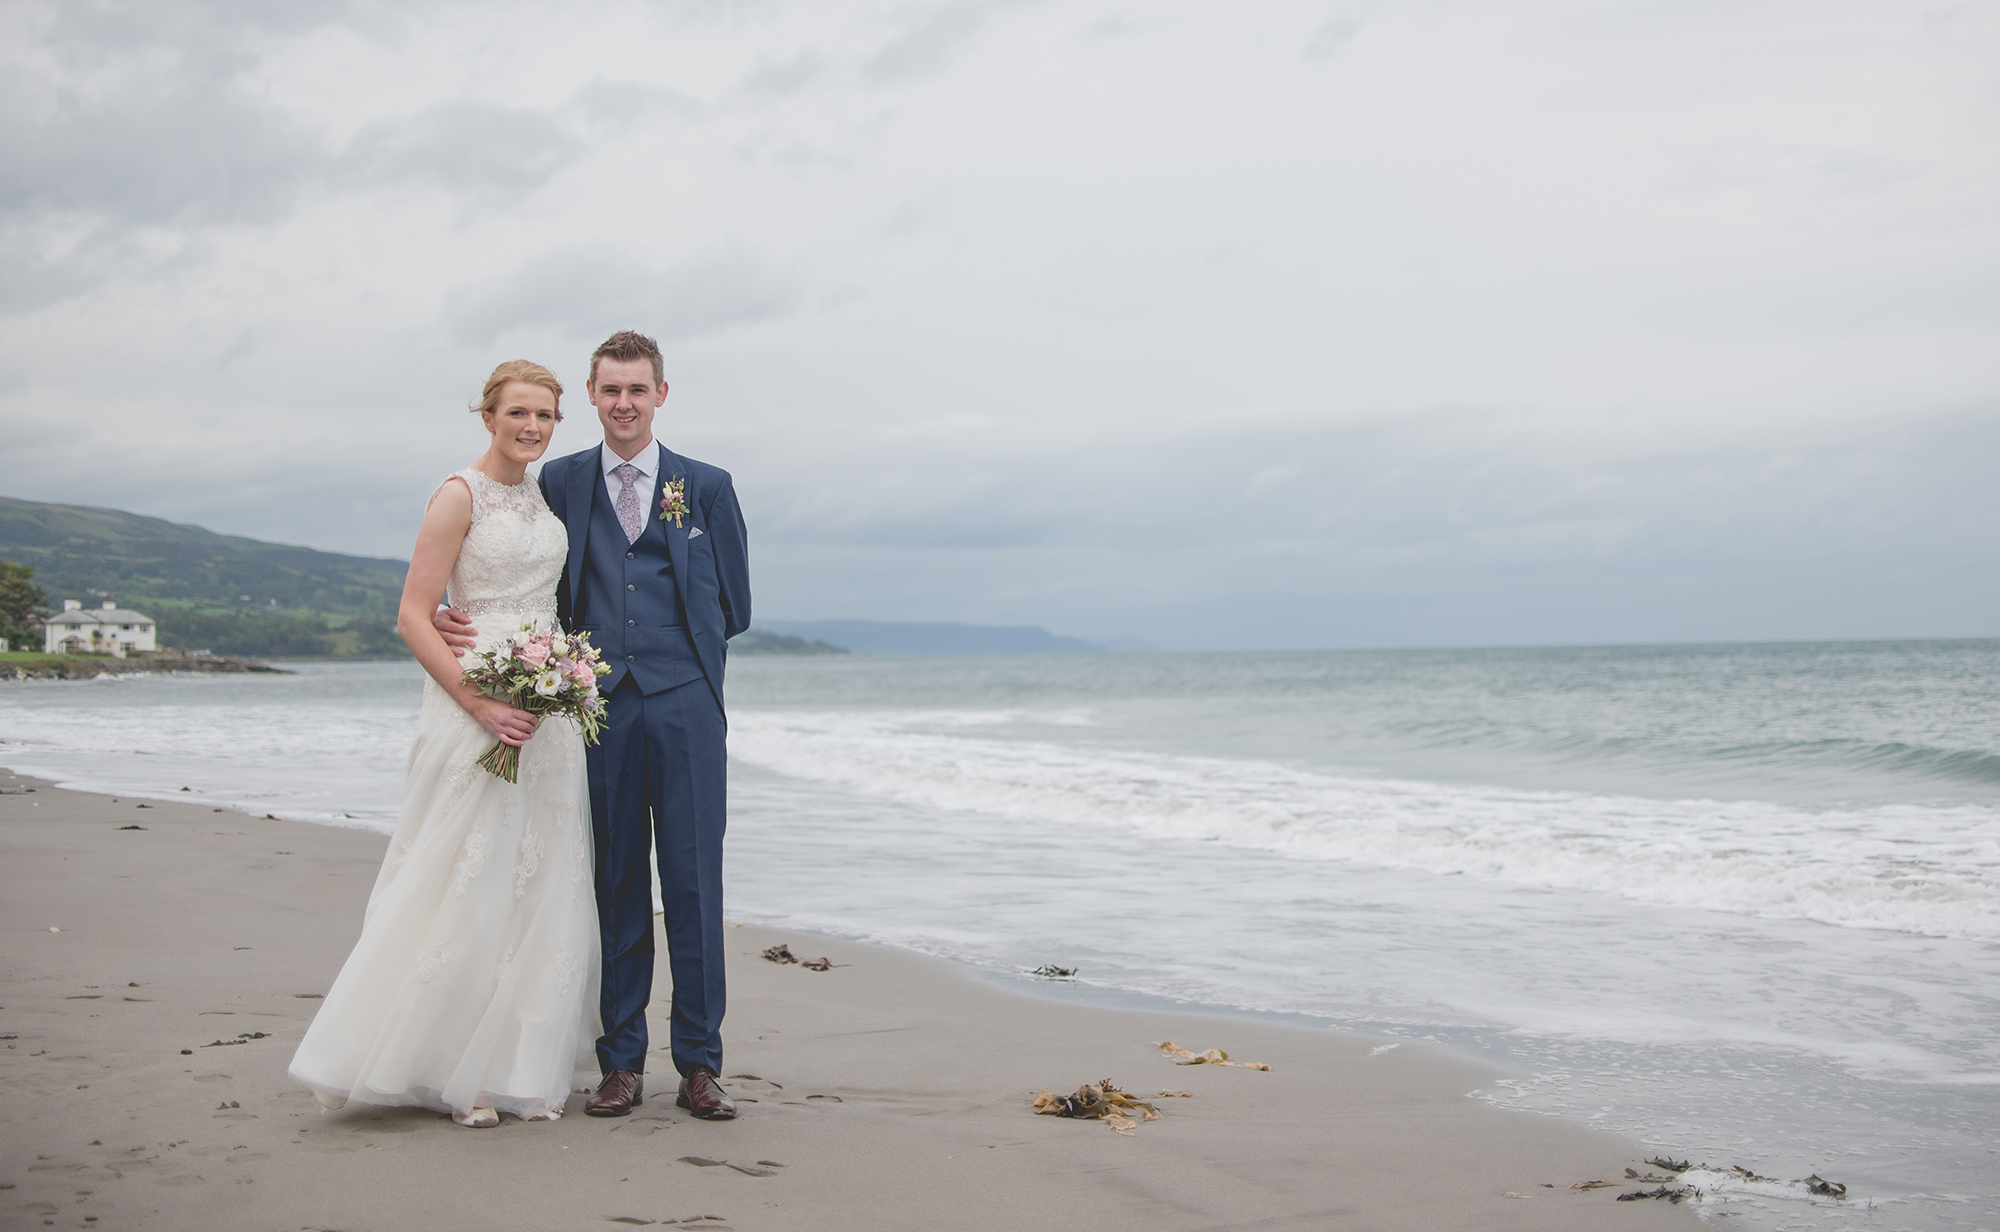 ballygally wedding photography tc photography larne belfast lisburn 14